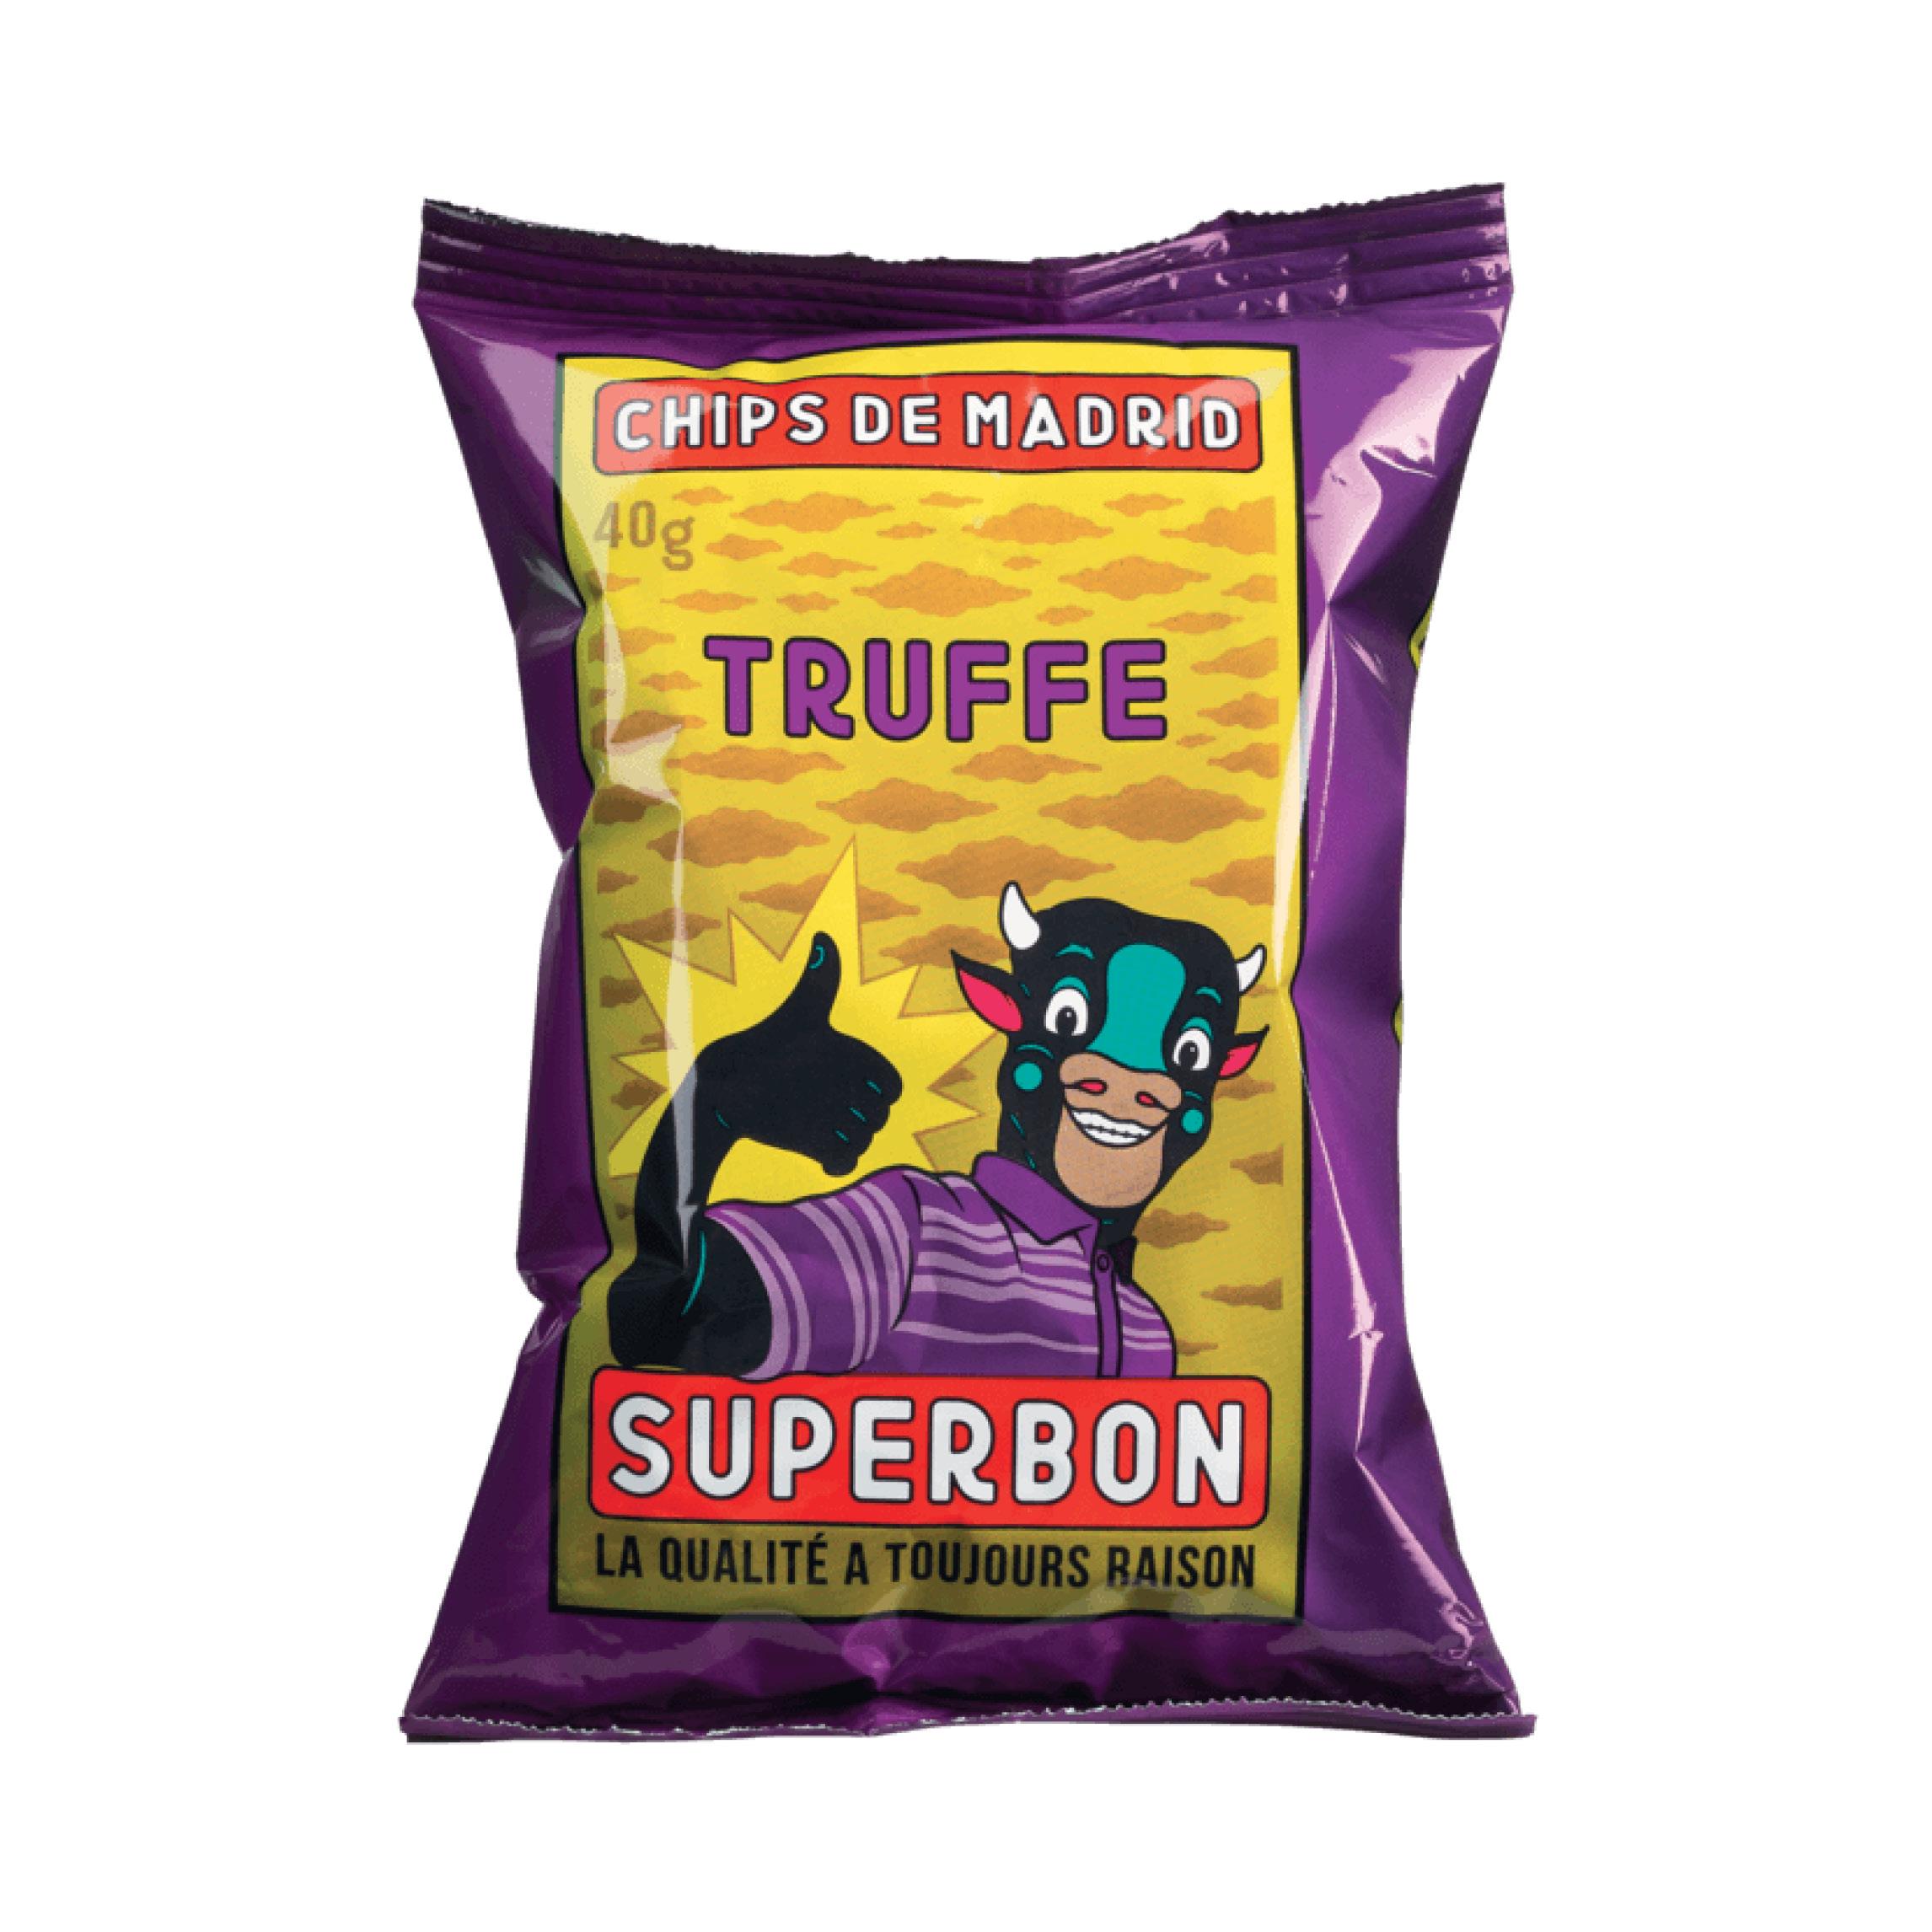 Chips de Madrid Truffe X Superbon